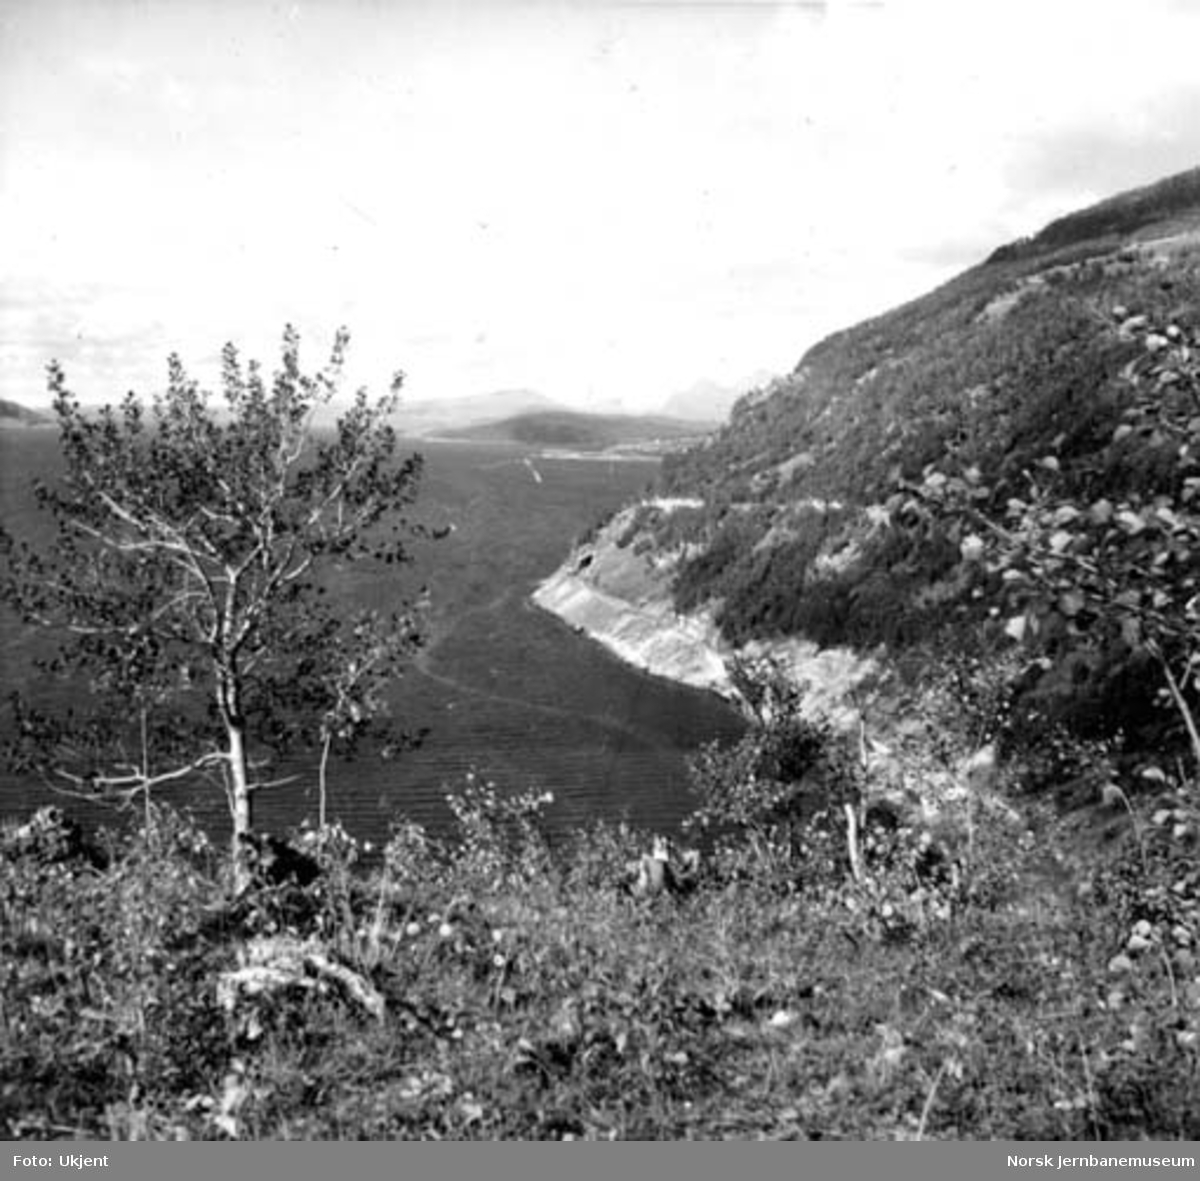 Nordlandsbanens trasé nord for Setså mot søndre innslag for Kvænfloget tunnel